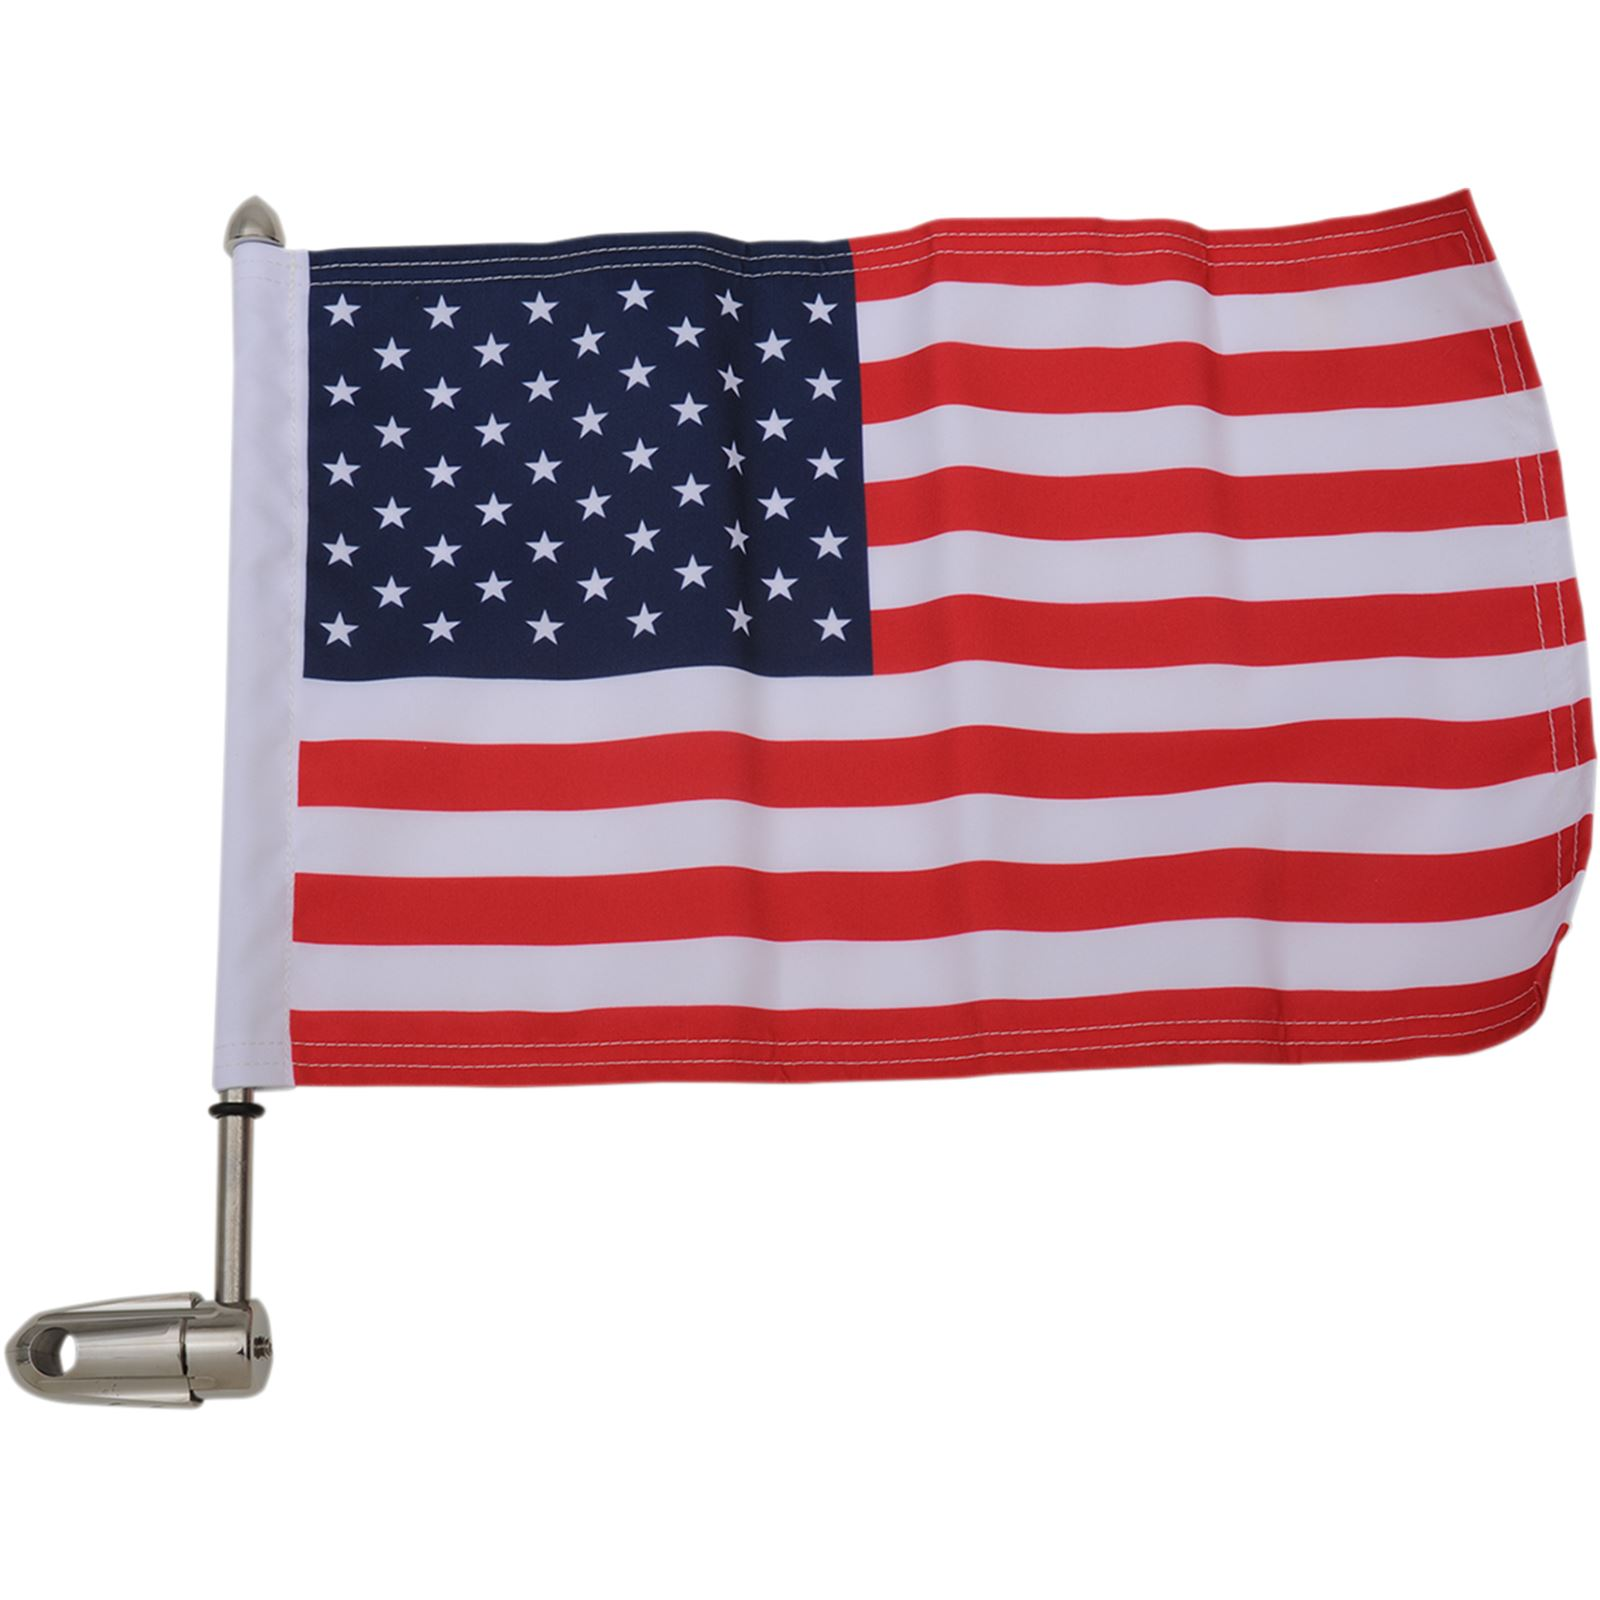 "Pro Pad Flag Mount - Luggage Rack - 13"" Pole - 10"" x 15"" Flag"